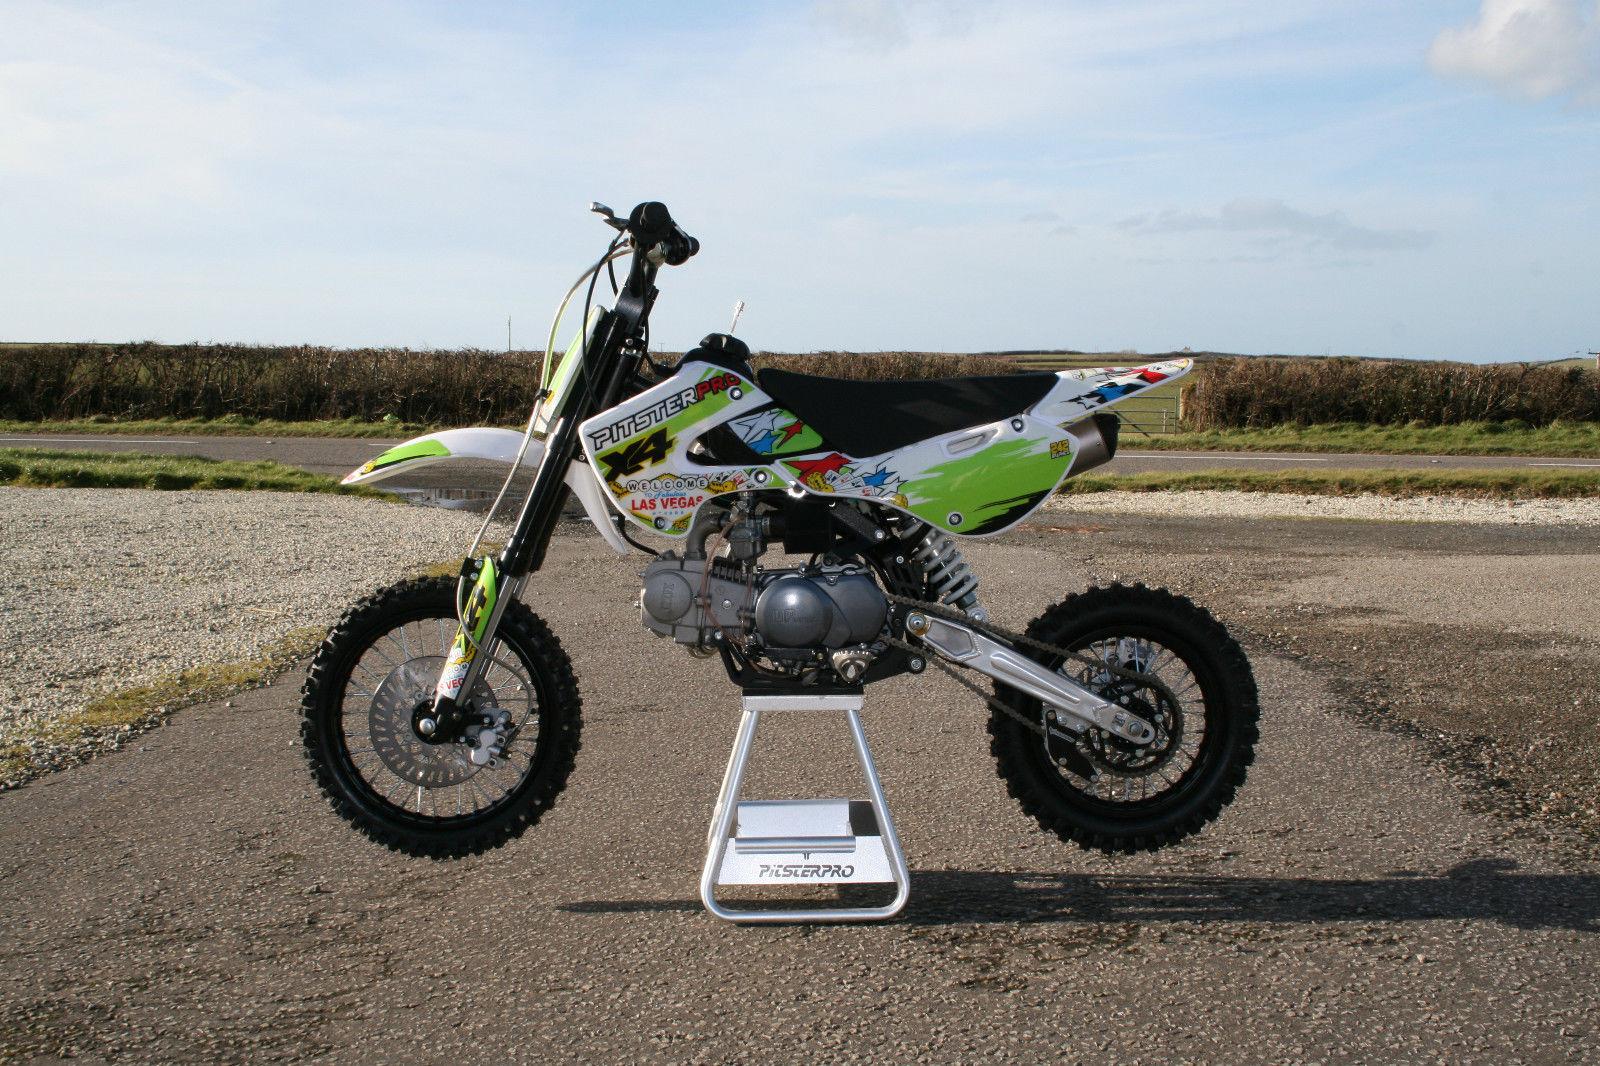 Pitster Pro X4 Klx110 Style Pitbike Pit Dirt Bike Pitsterpro Upower 125cc